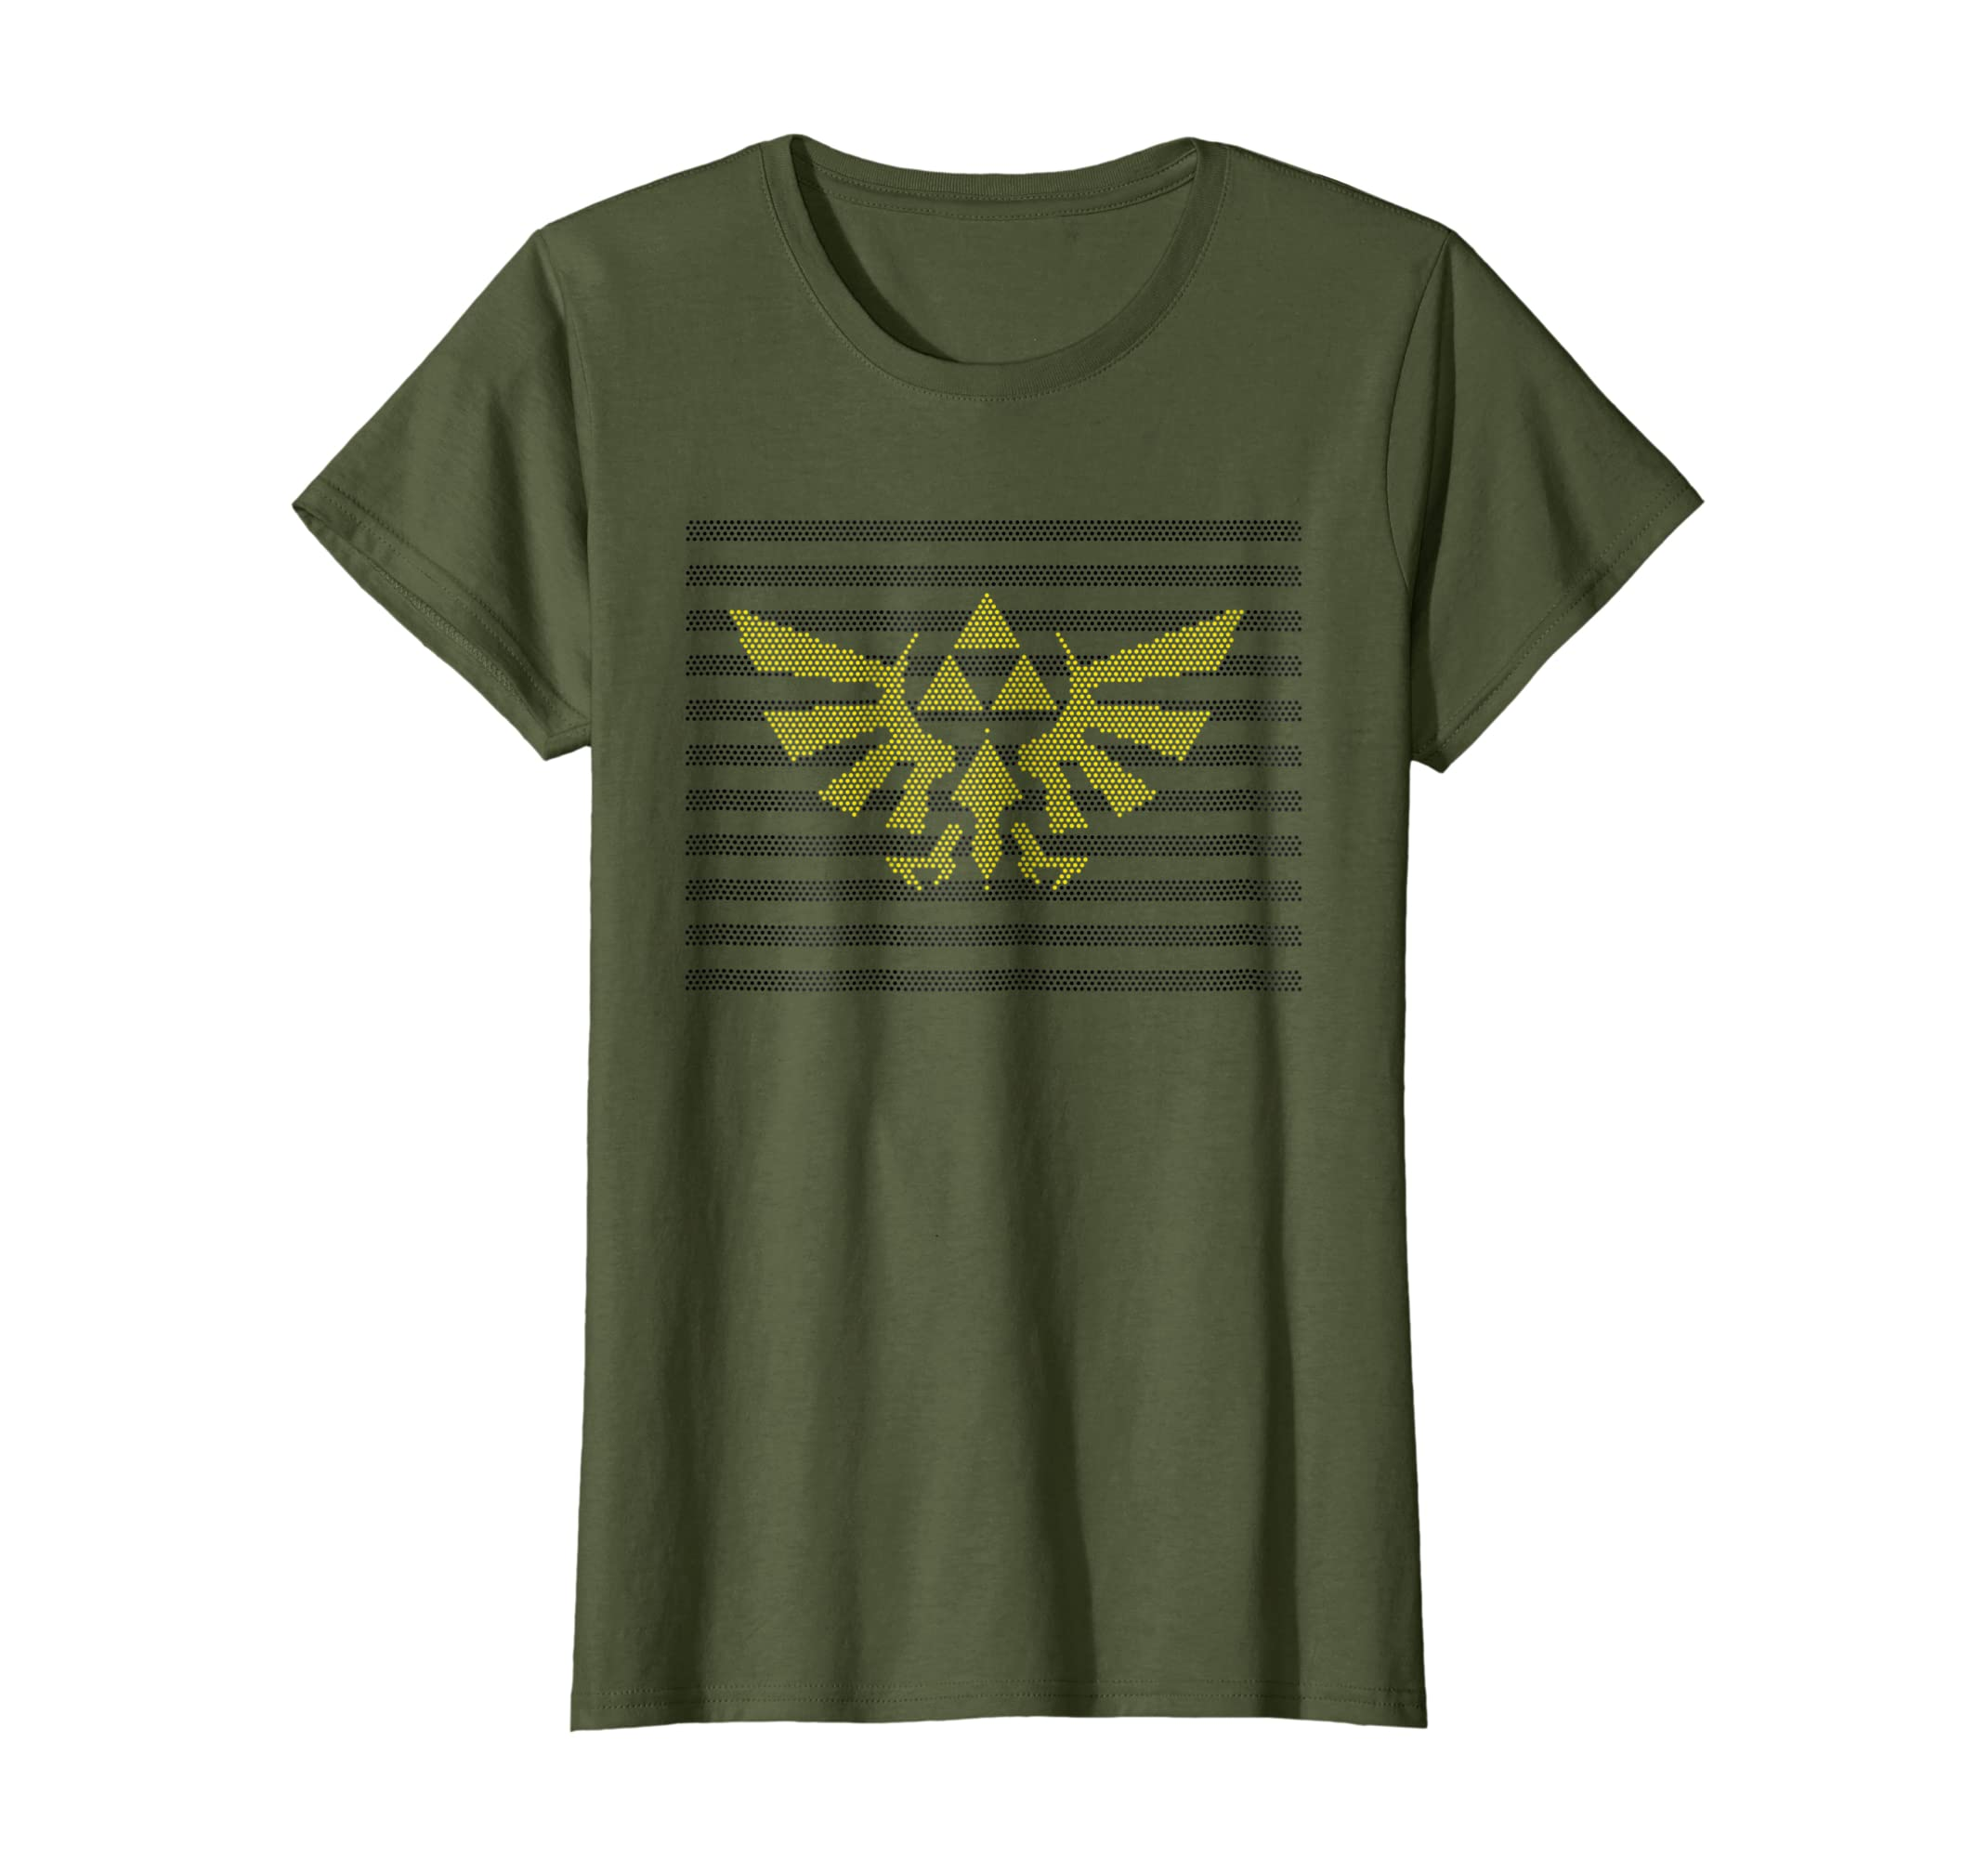 Nintendo Zelda Hylian Triforce Dot Pattern Graphic T Shirt-Teesml